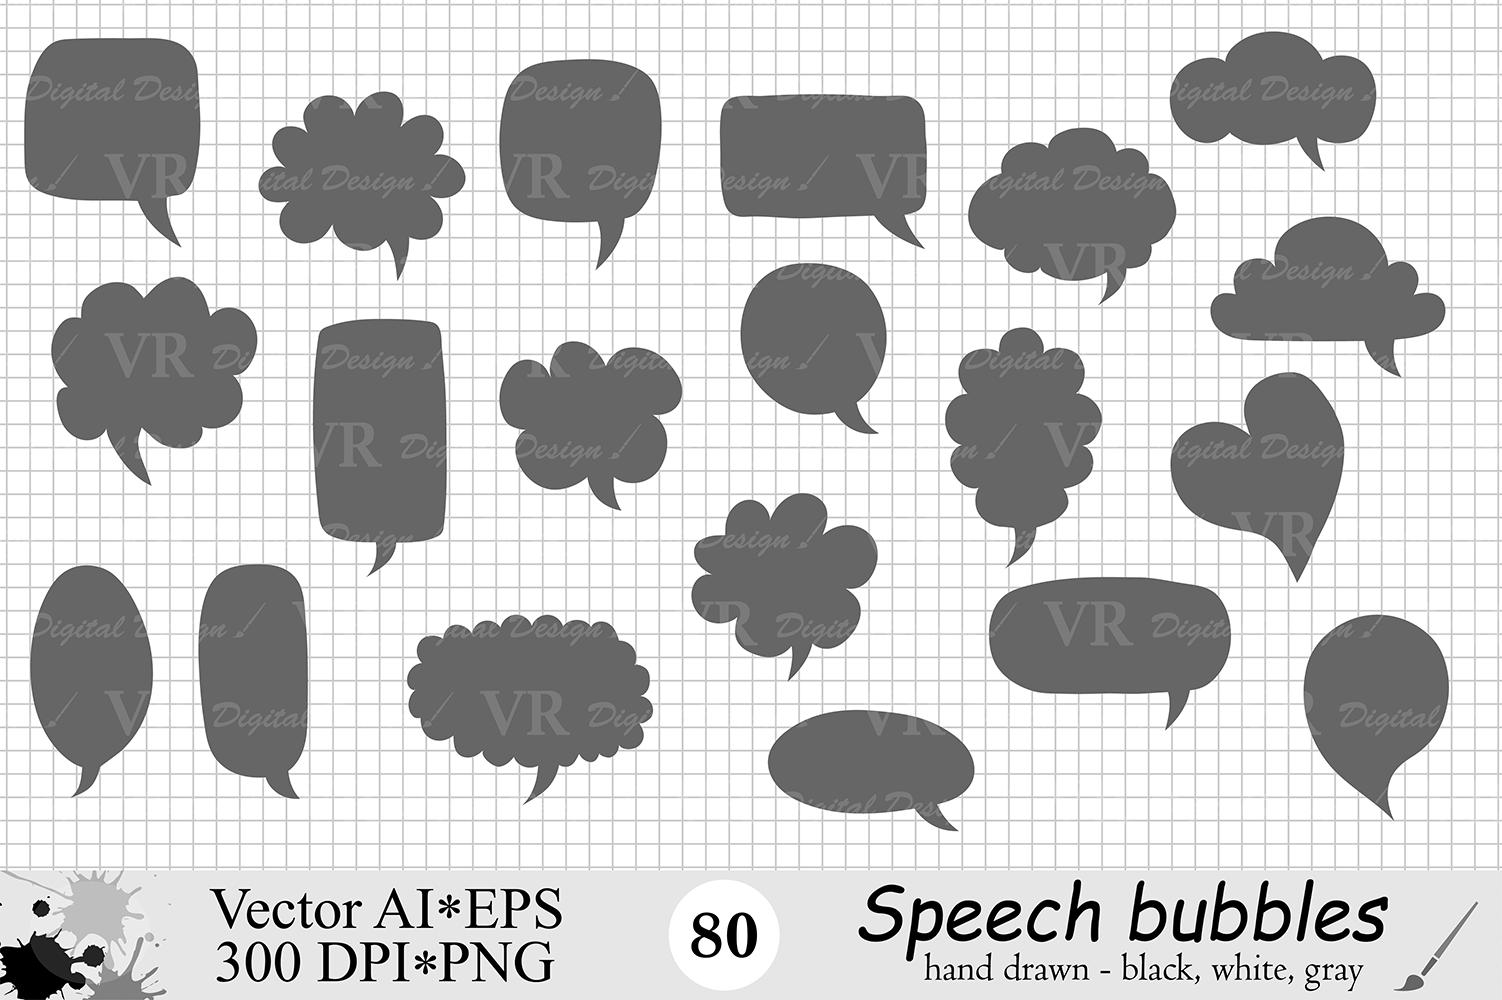 Speech Bubbles Clipart / Chat Bubbles / Hand drawn Text bubbles / Black, White, Gray - Vector example image 3